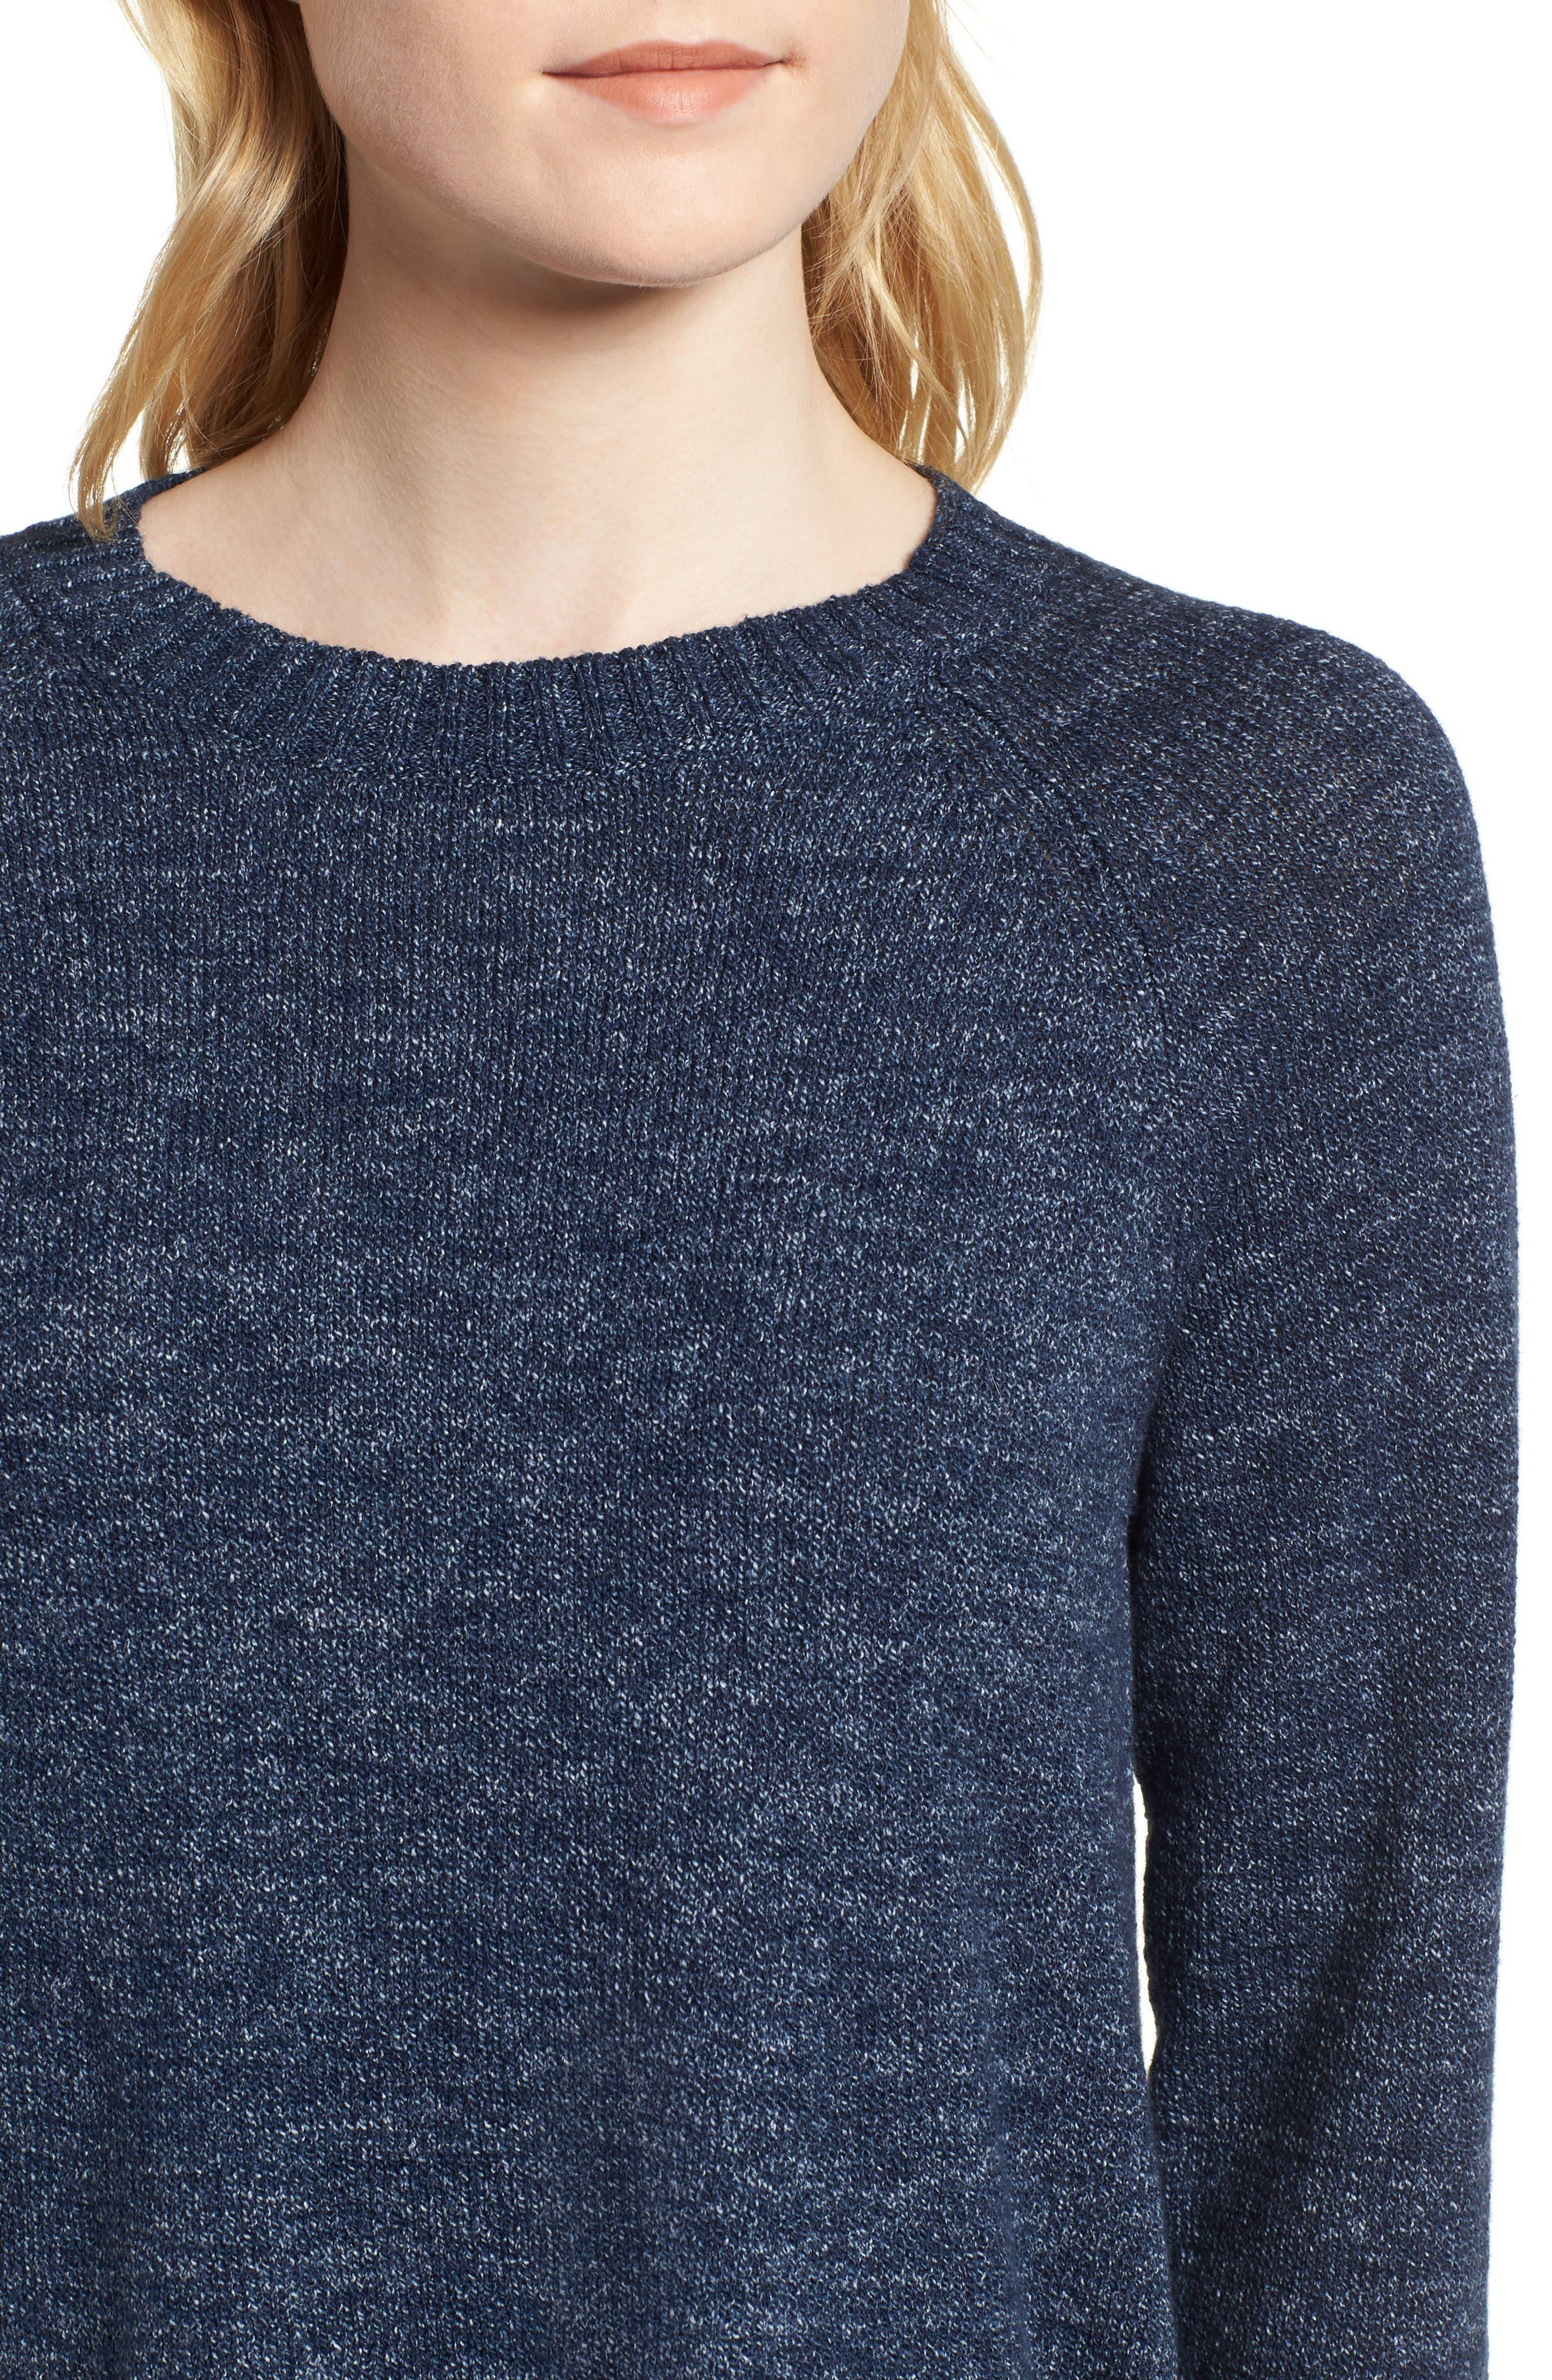 Organic Cotton Sweater,                             Alternate thumbnail 4, color,                             480